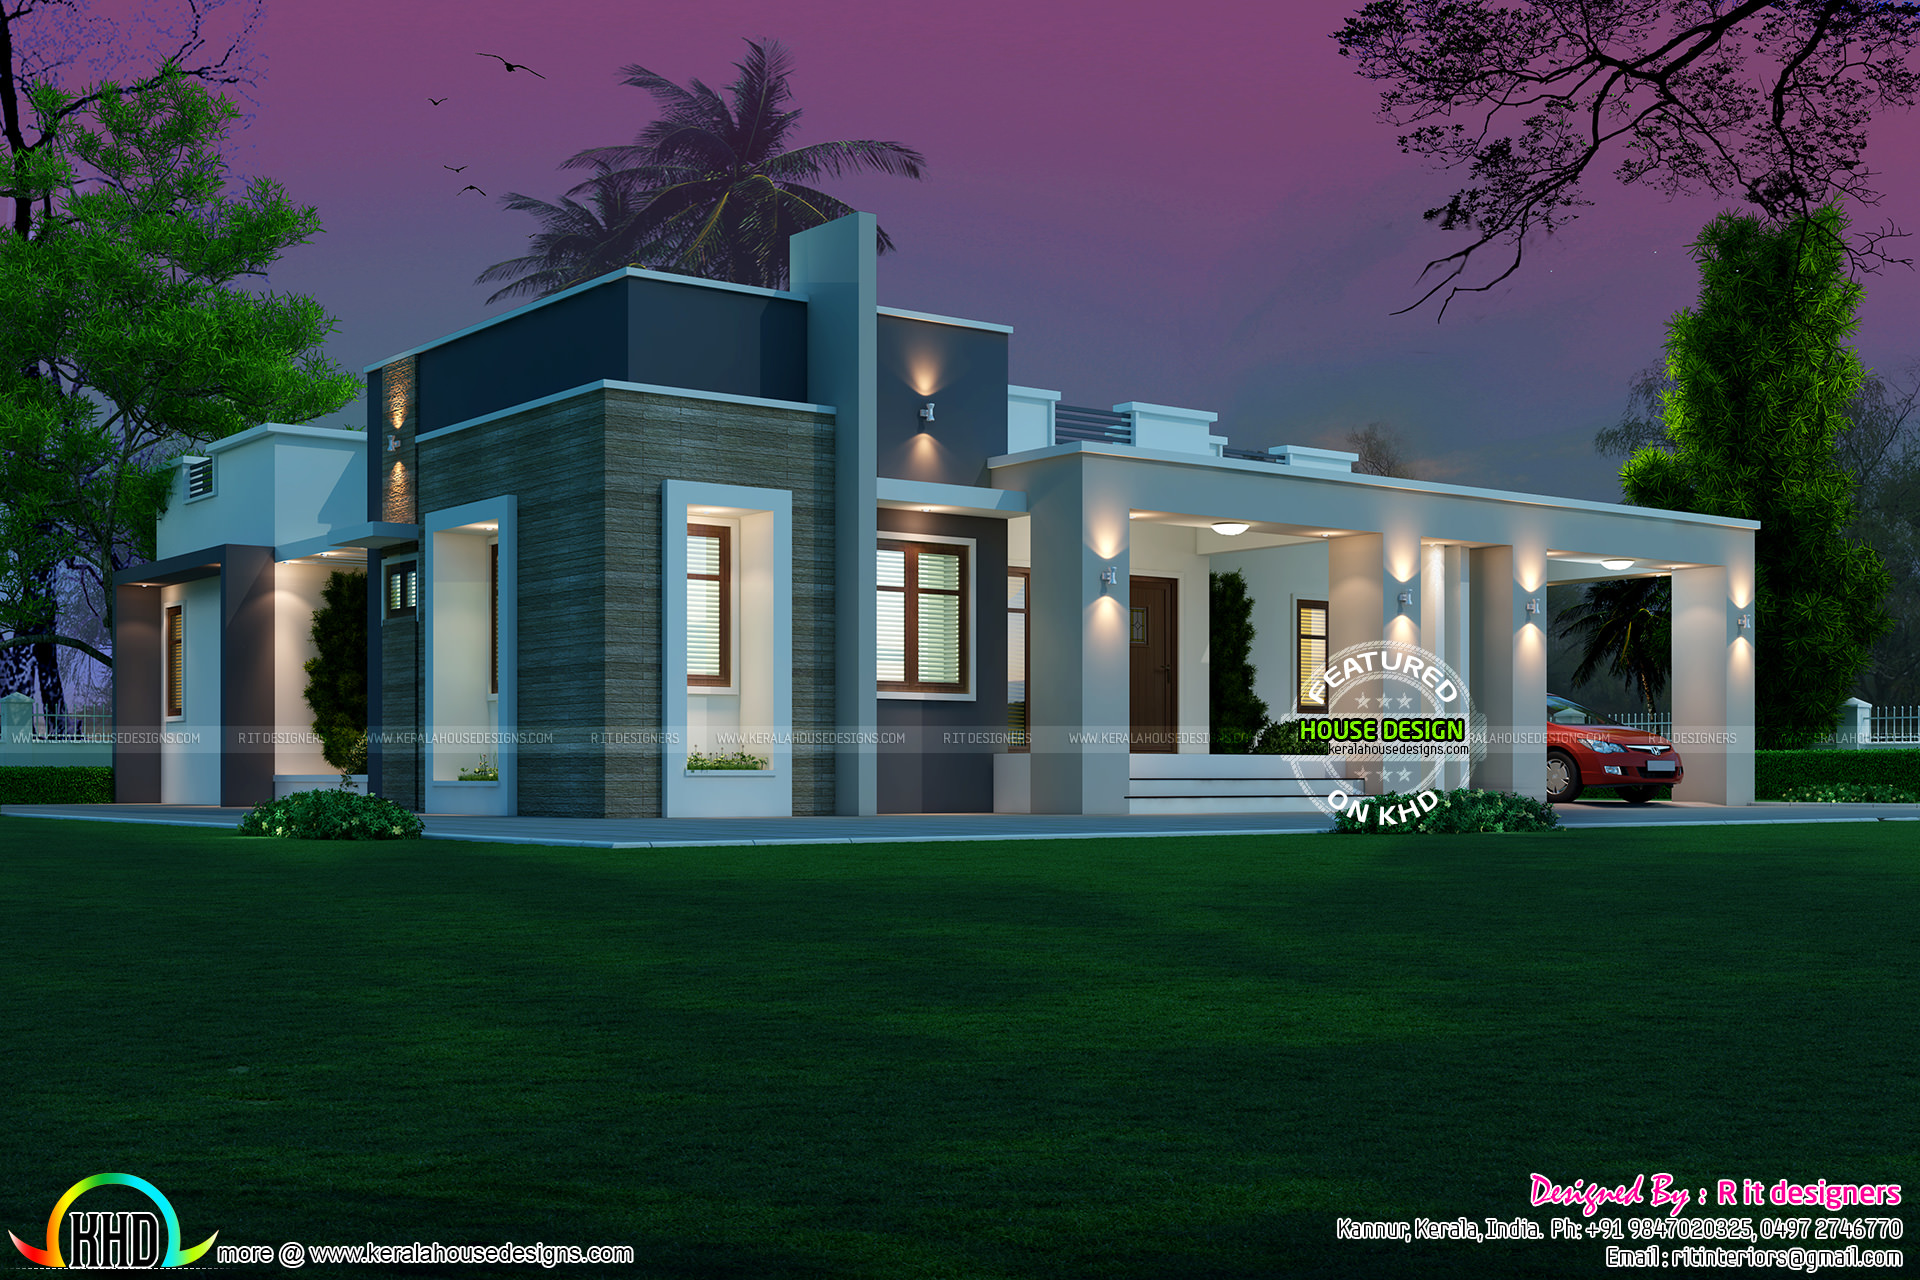 3 bedroom modern single floor ₹40 laks cost - Kerala home ...